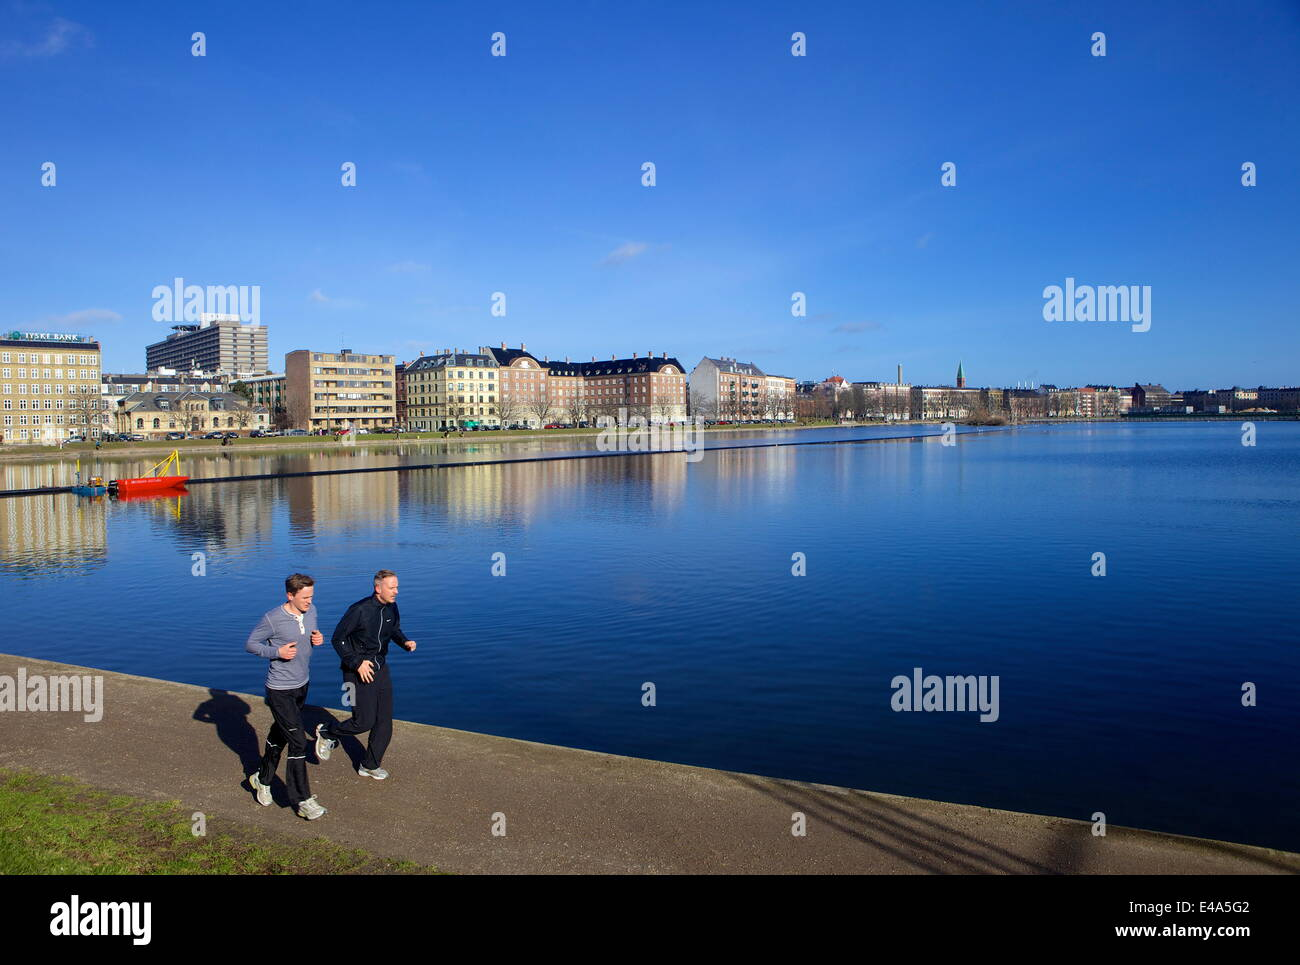 Joggers along Sortedams So (Sortedams Lake), Copenhagen, Denmark, Scandinavia, Europe - Stock Image